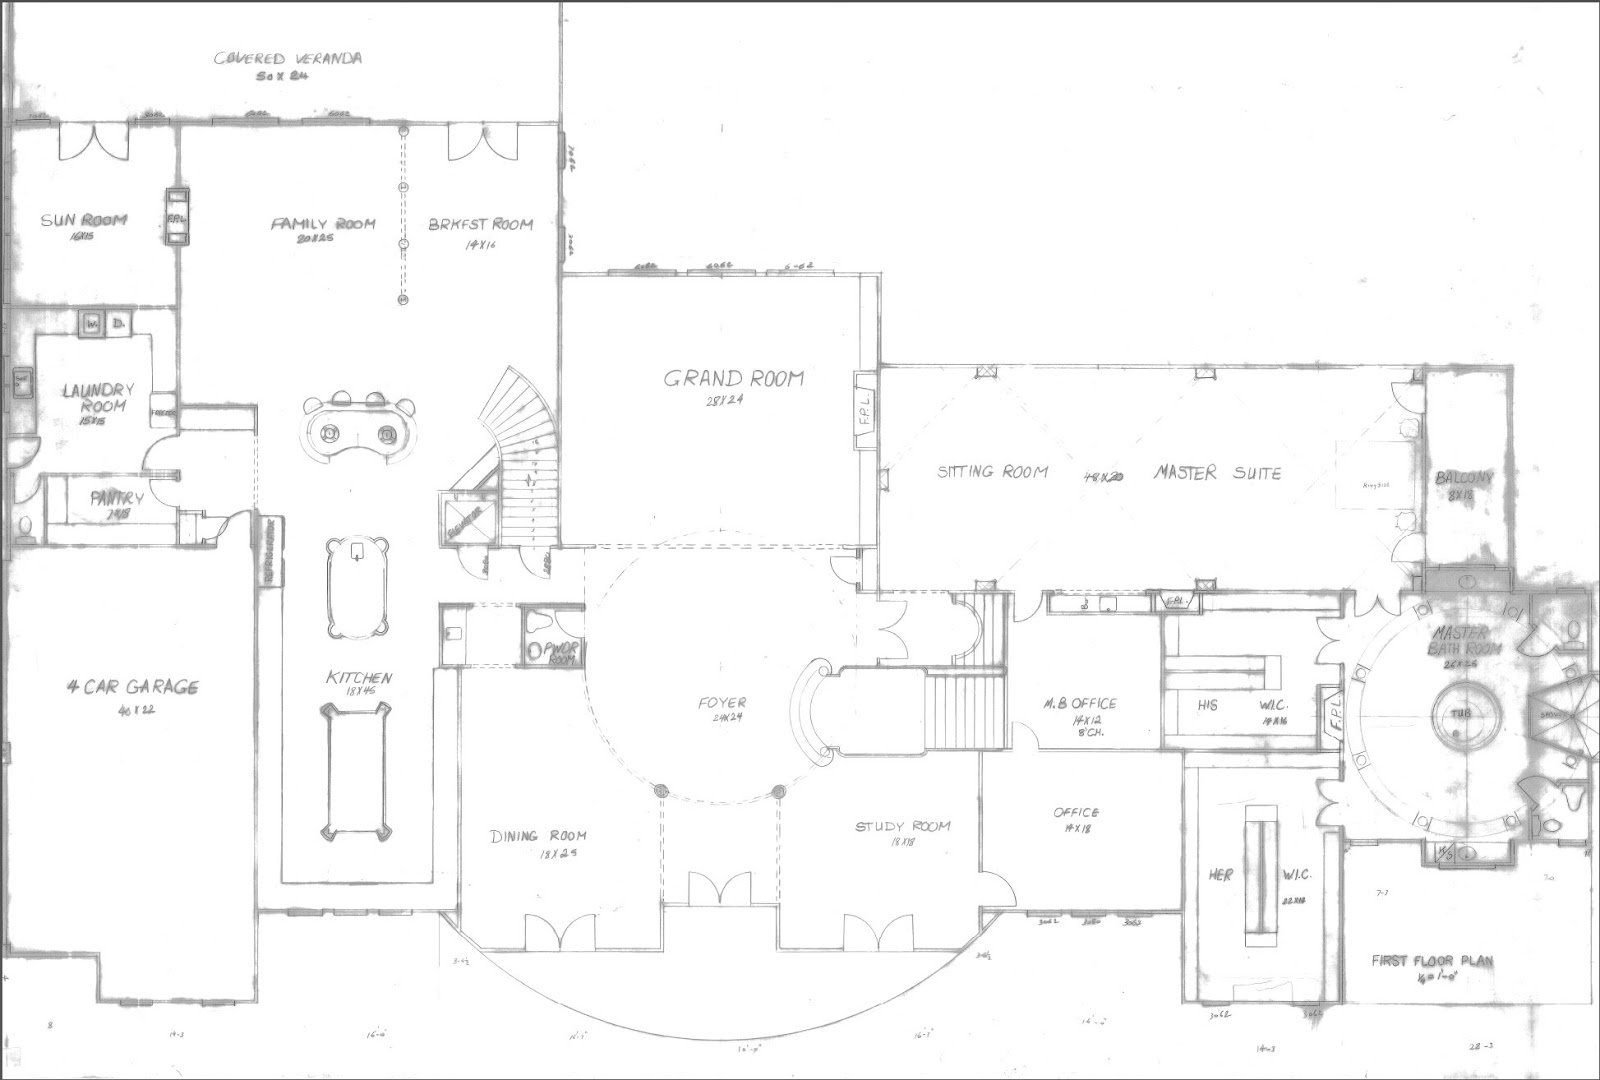 Stunning Mcdonald Jones Homes Designs Pictures - Decorating Design ...